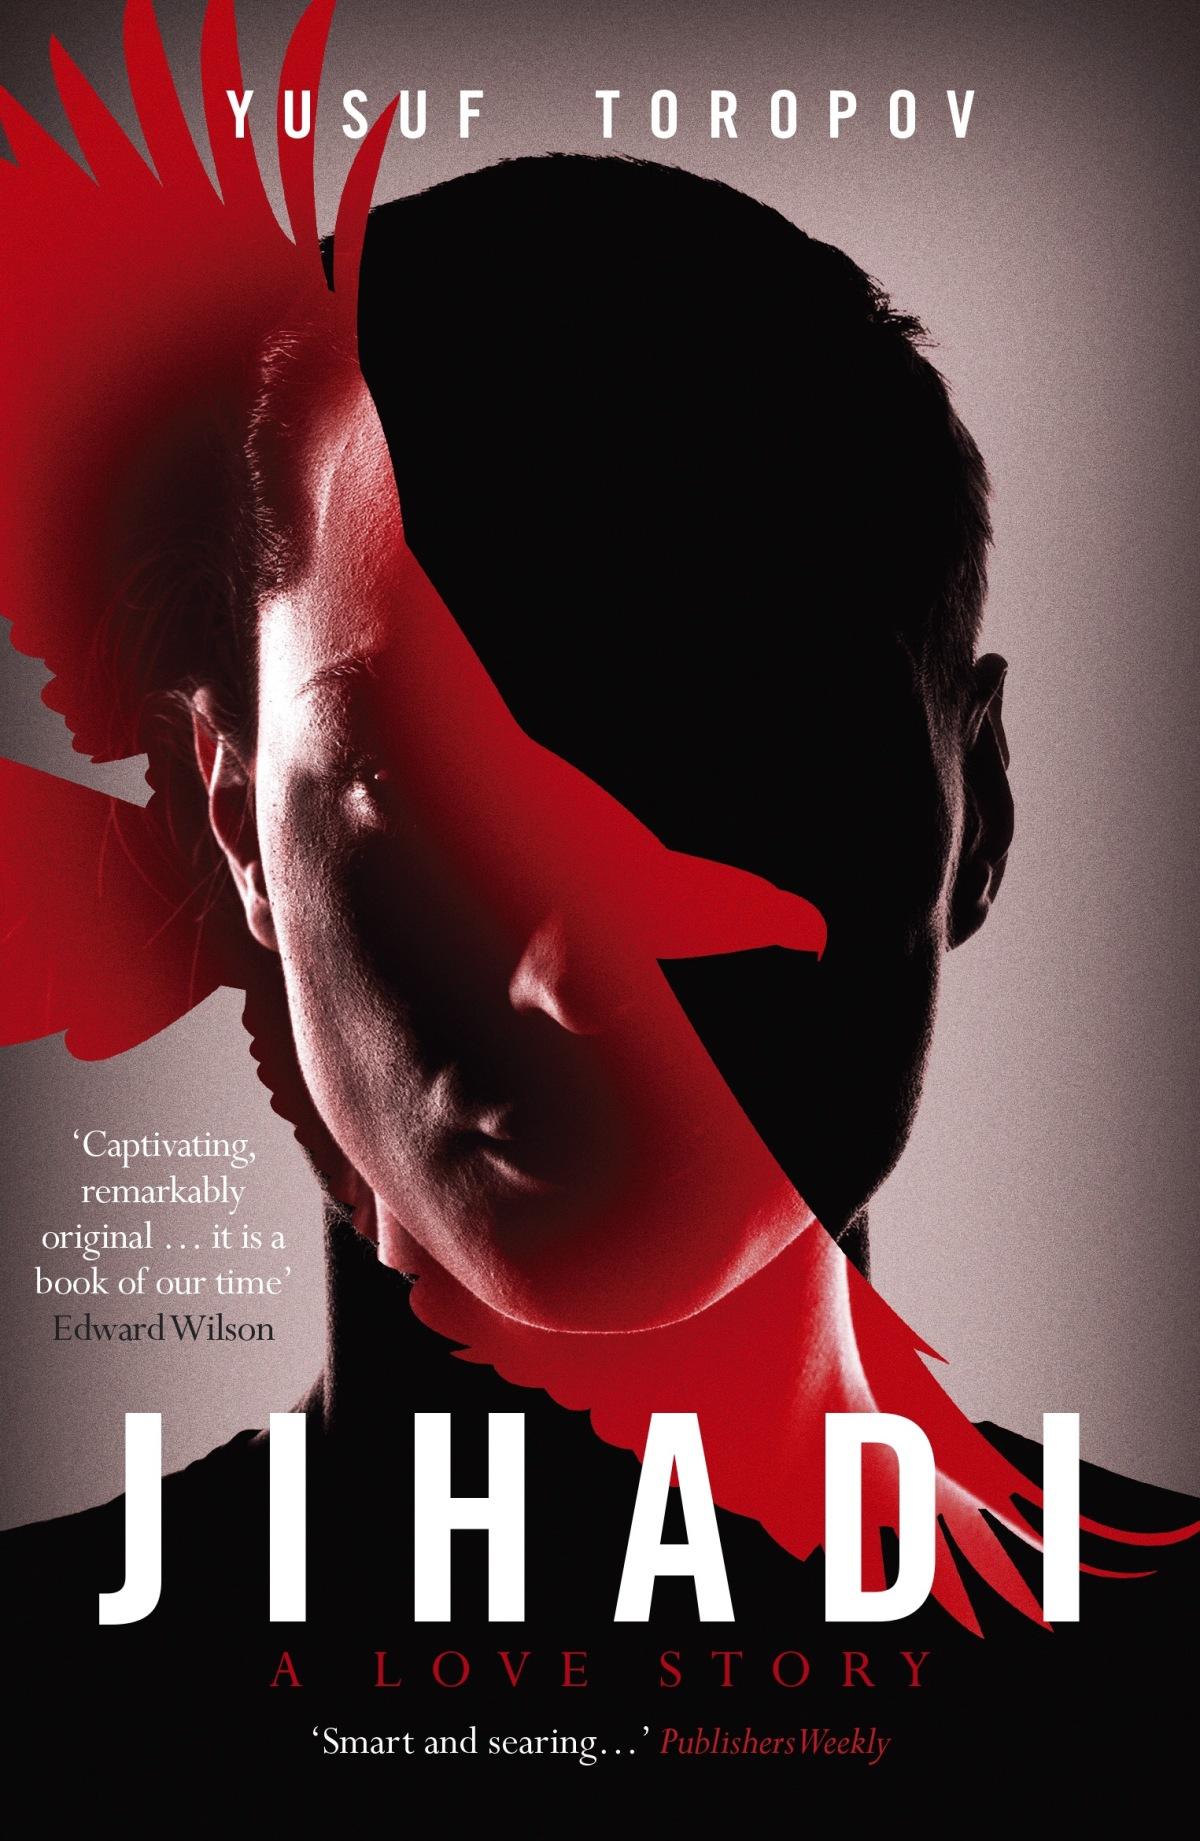 Jihadi: A Love Story by YusufToropov